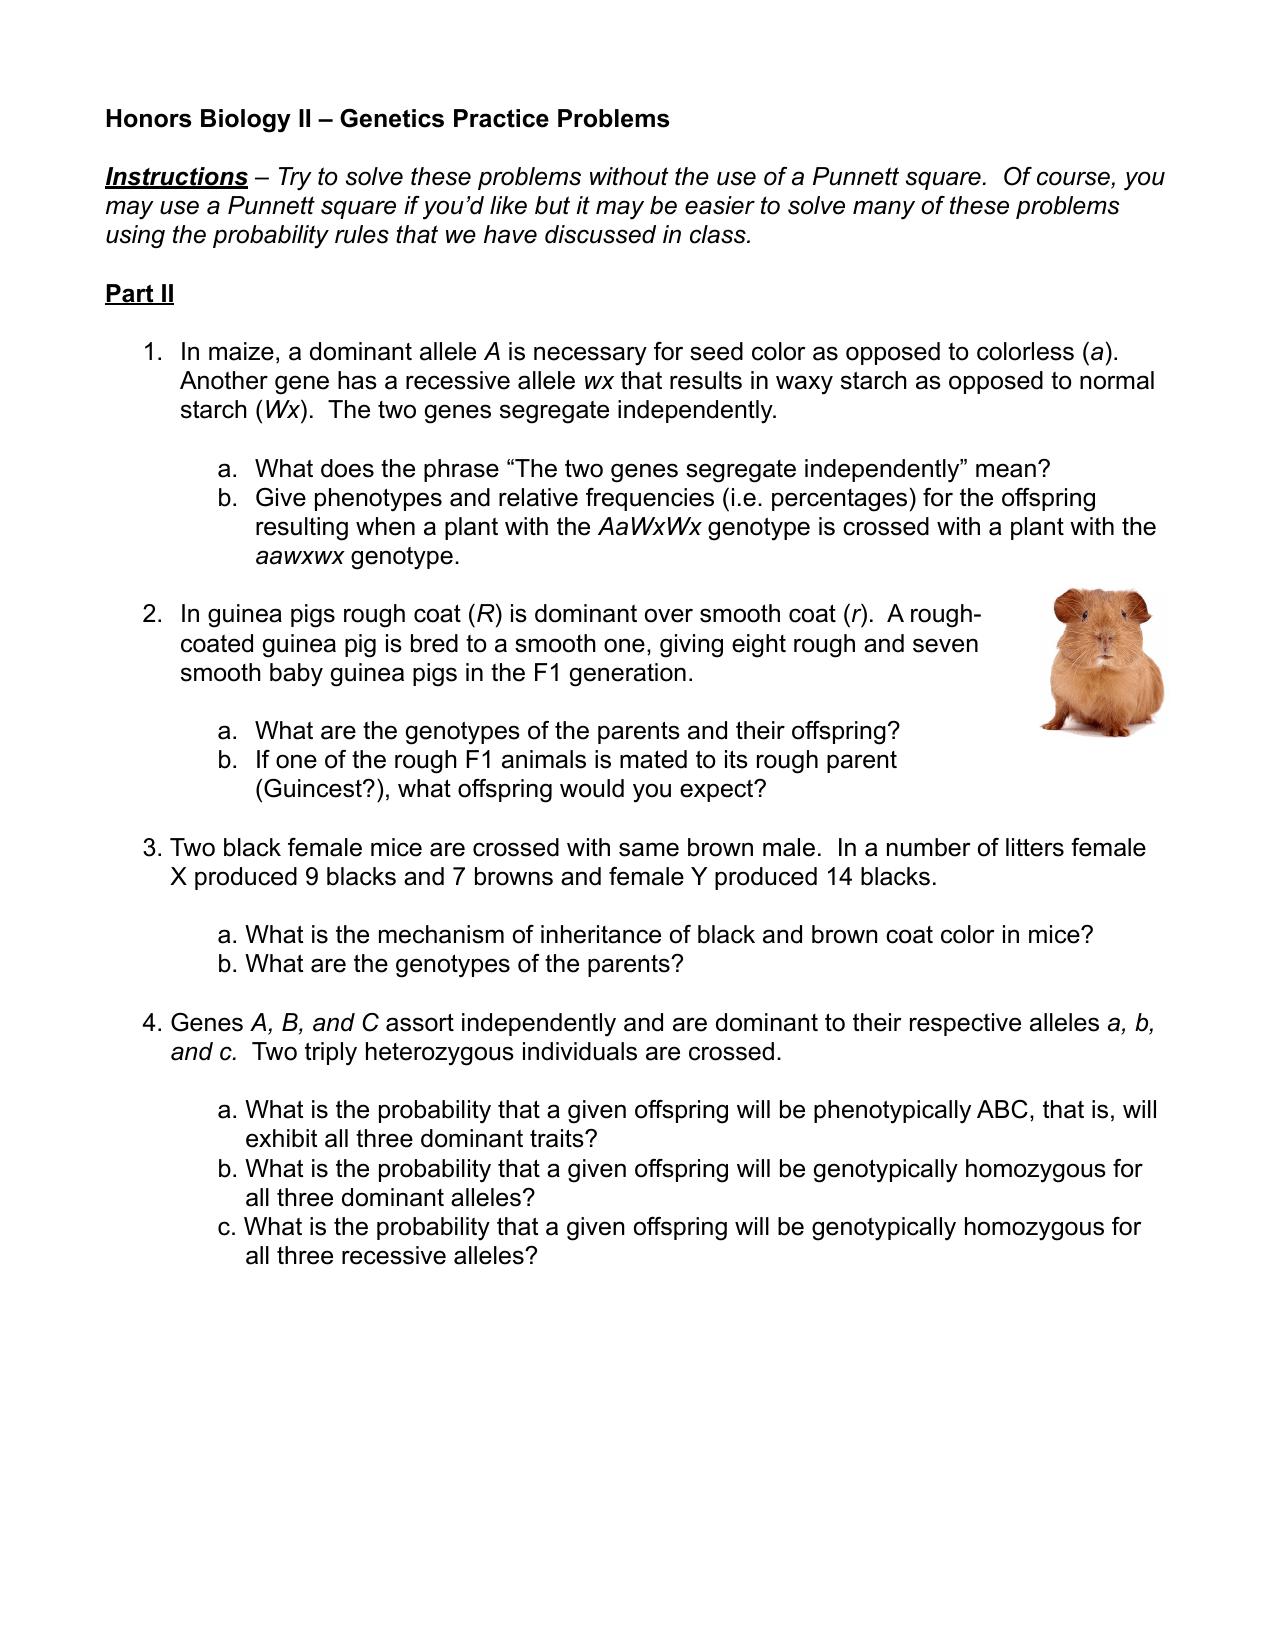 Scojo262 Worksheet Answer Simple Genetics Practice Problems